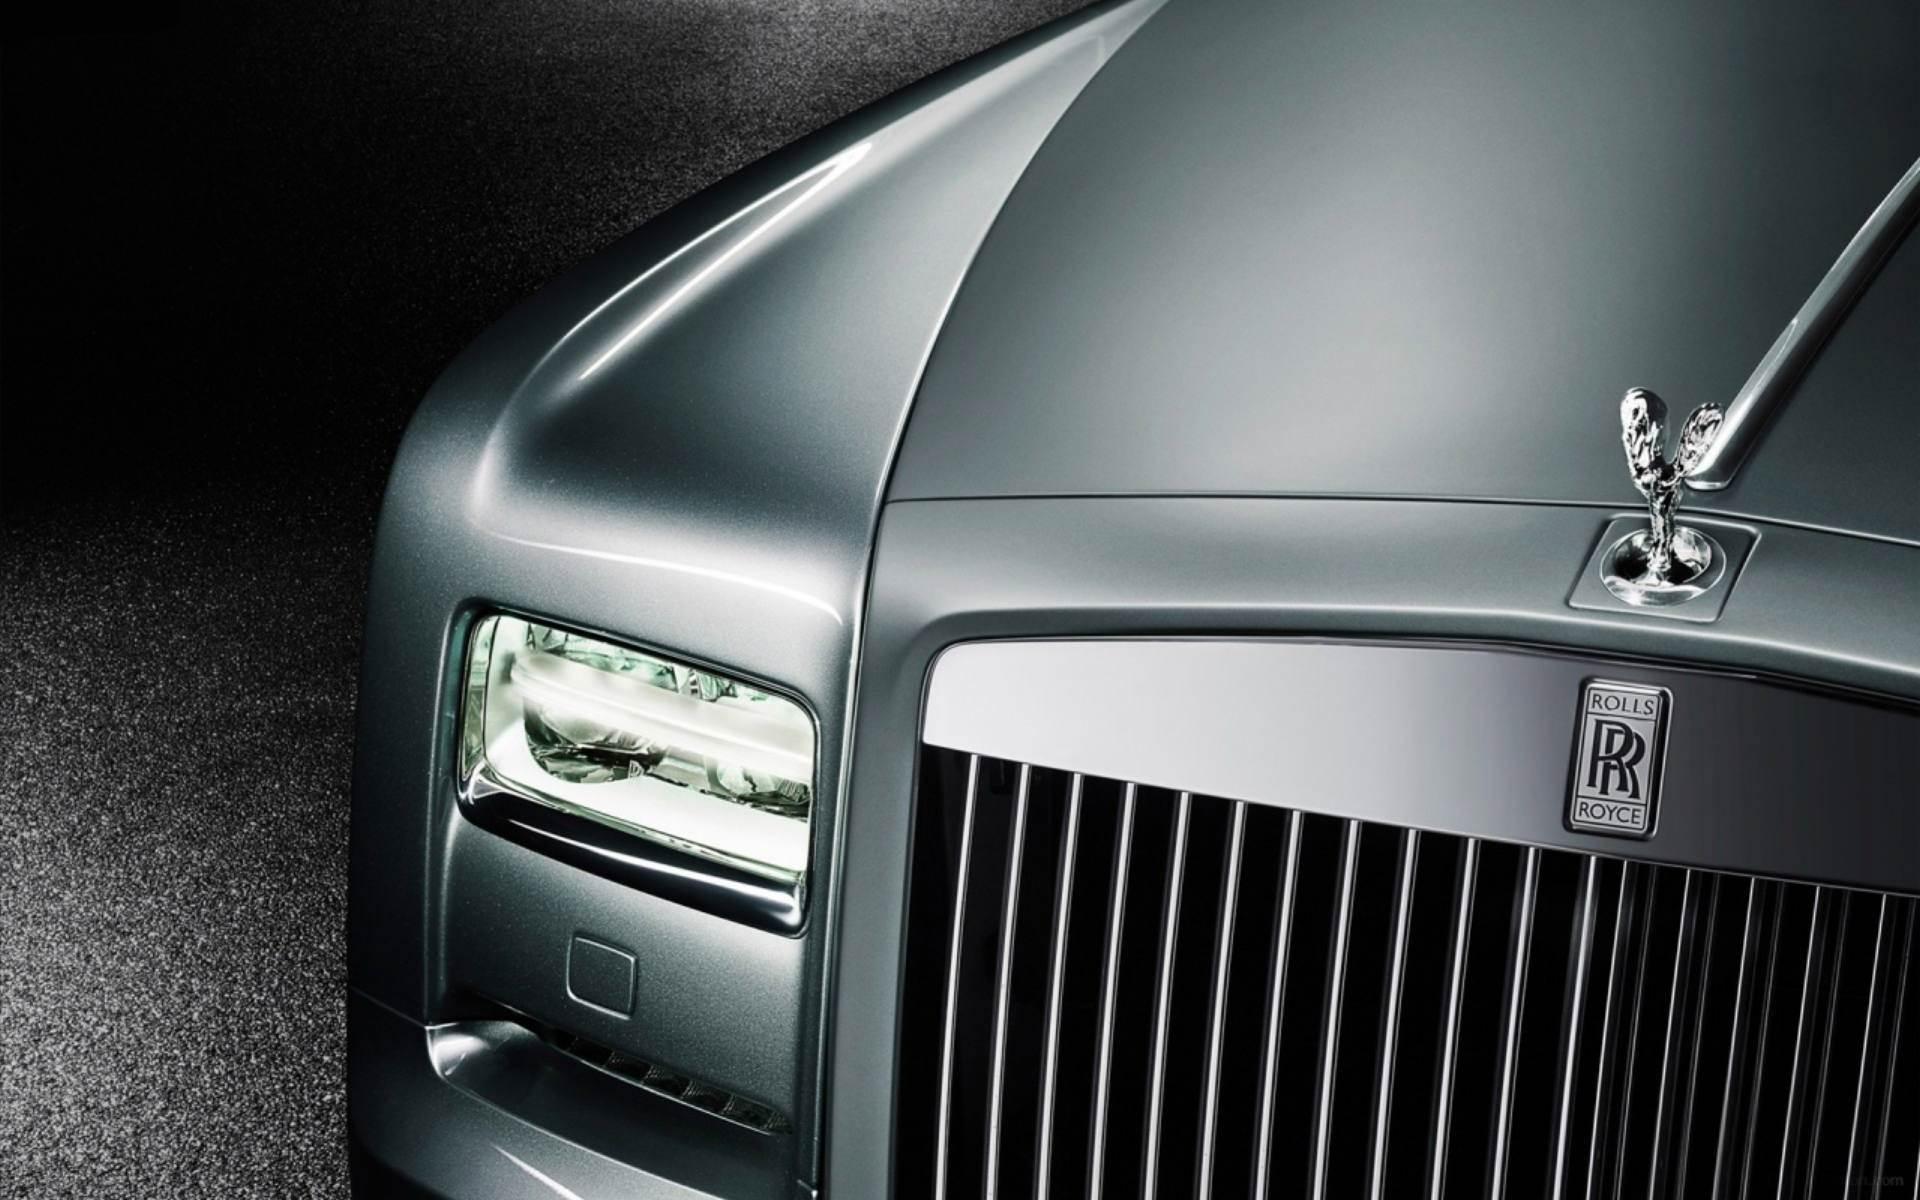 2015 Rolls Royce Wraith Wallpaper Download Phantom Coupe